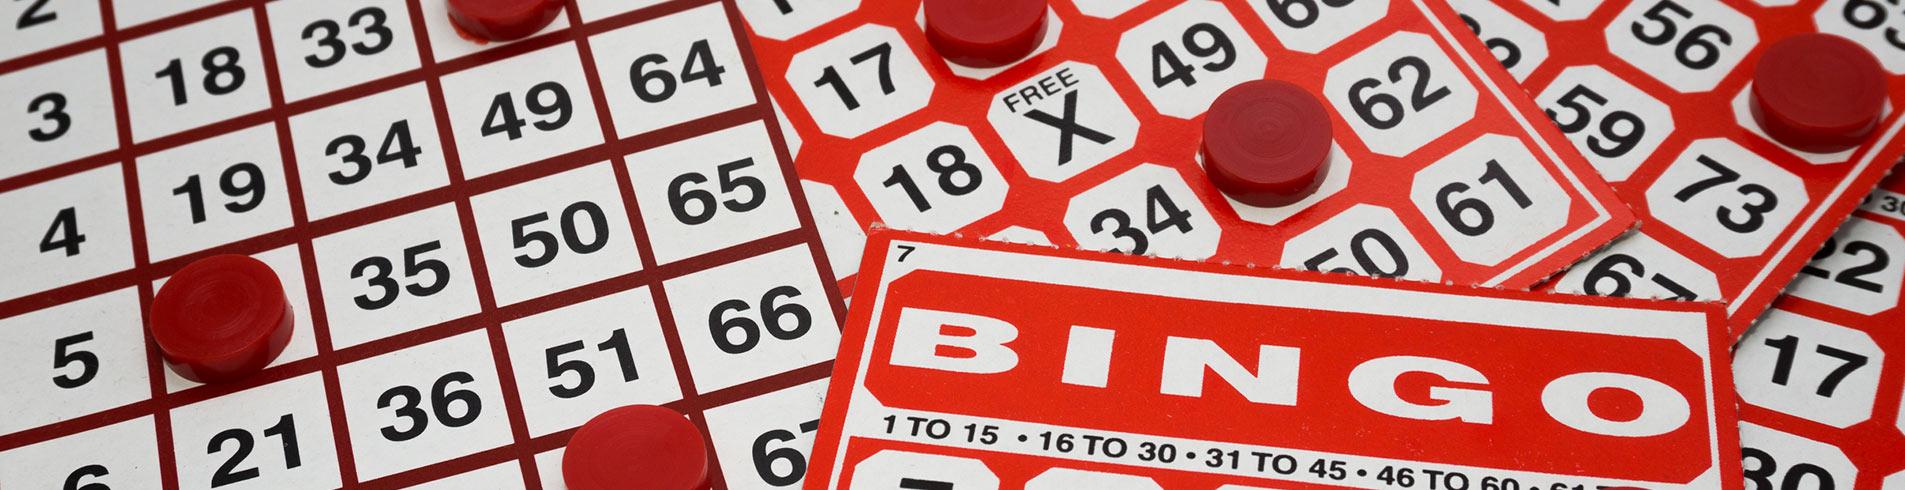 Bingo Fundraiser : May 7, 2018